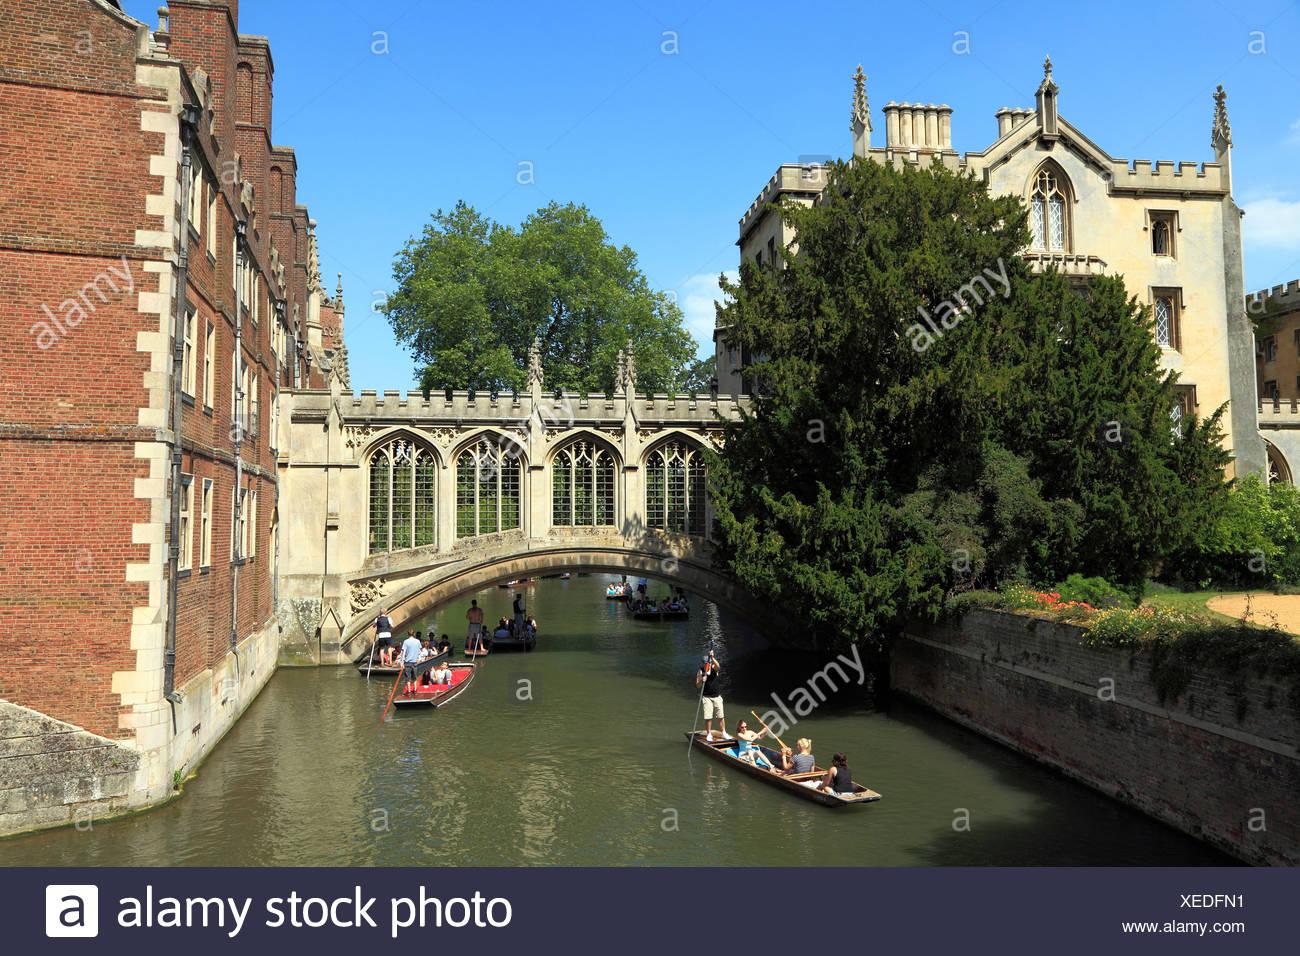 Cambridge, Bridge of Sighs, River Cam, St. Johns College, punts England UK - Stock Image